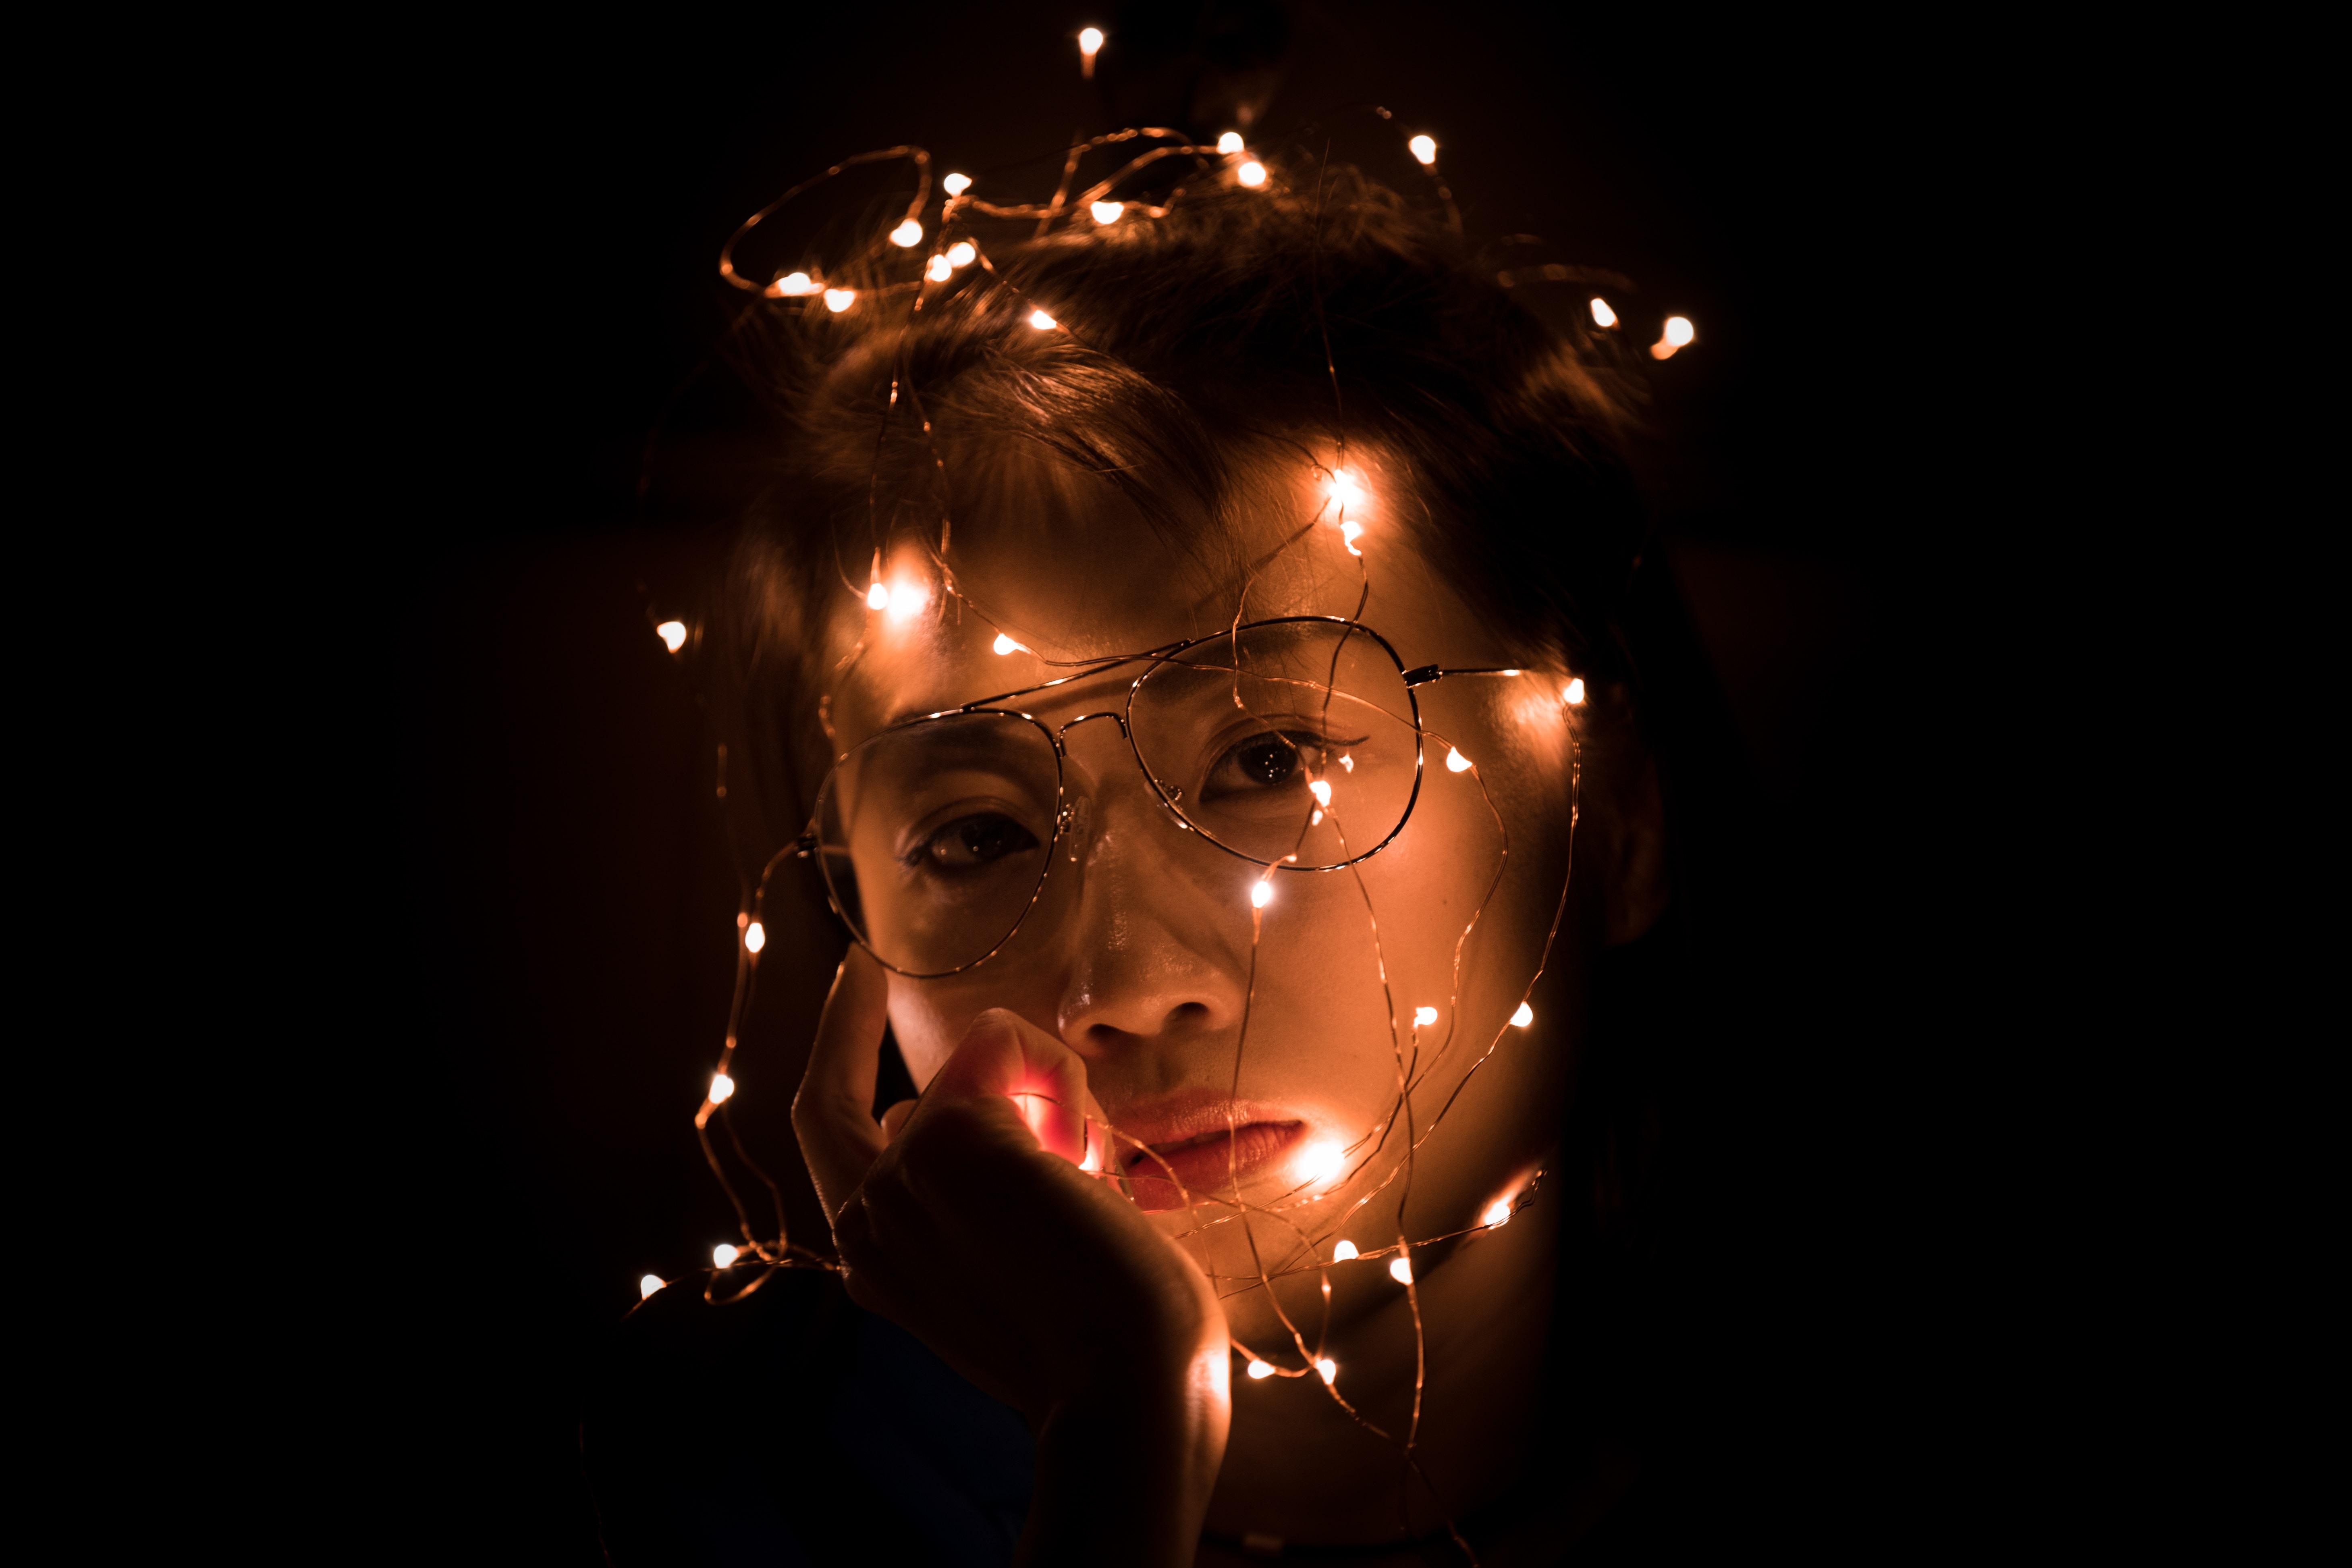 string light portrait photography of woman wearing eyeglasses